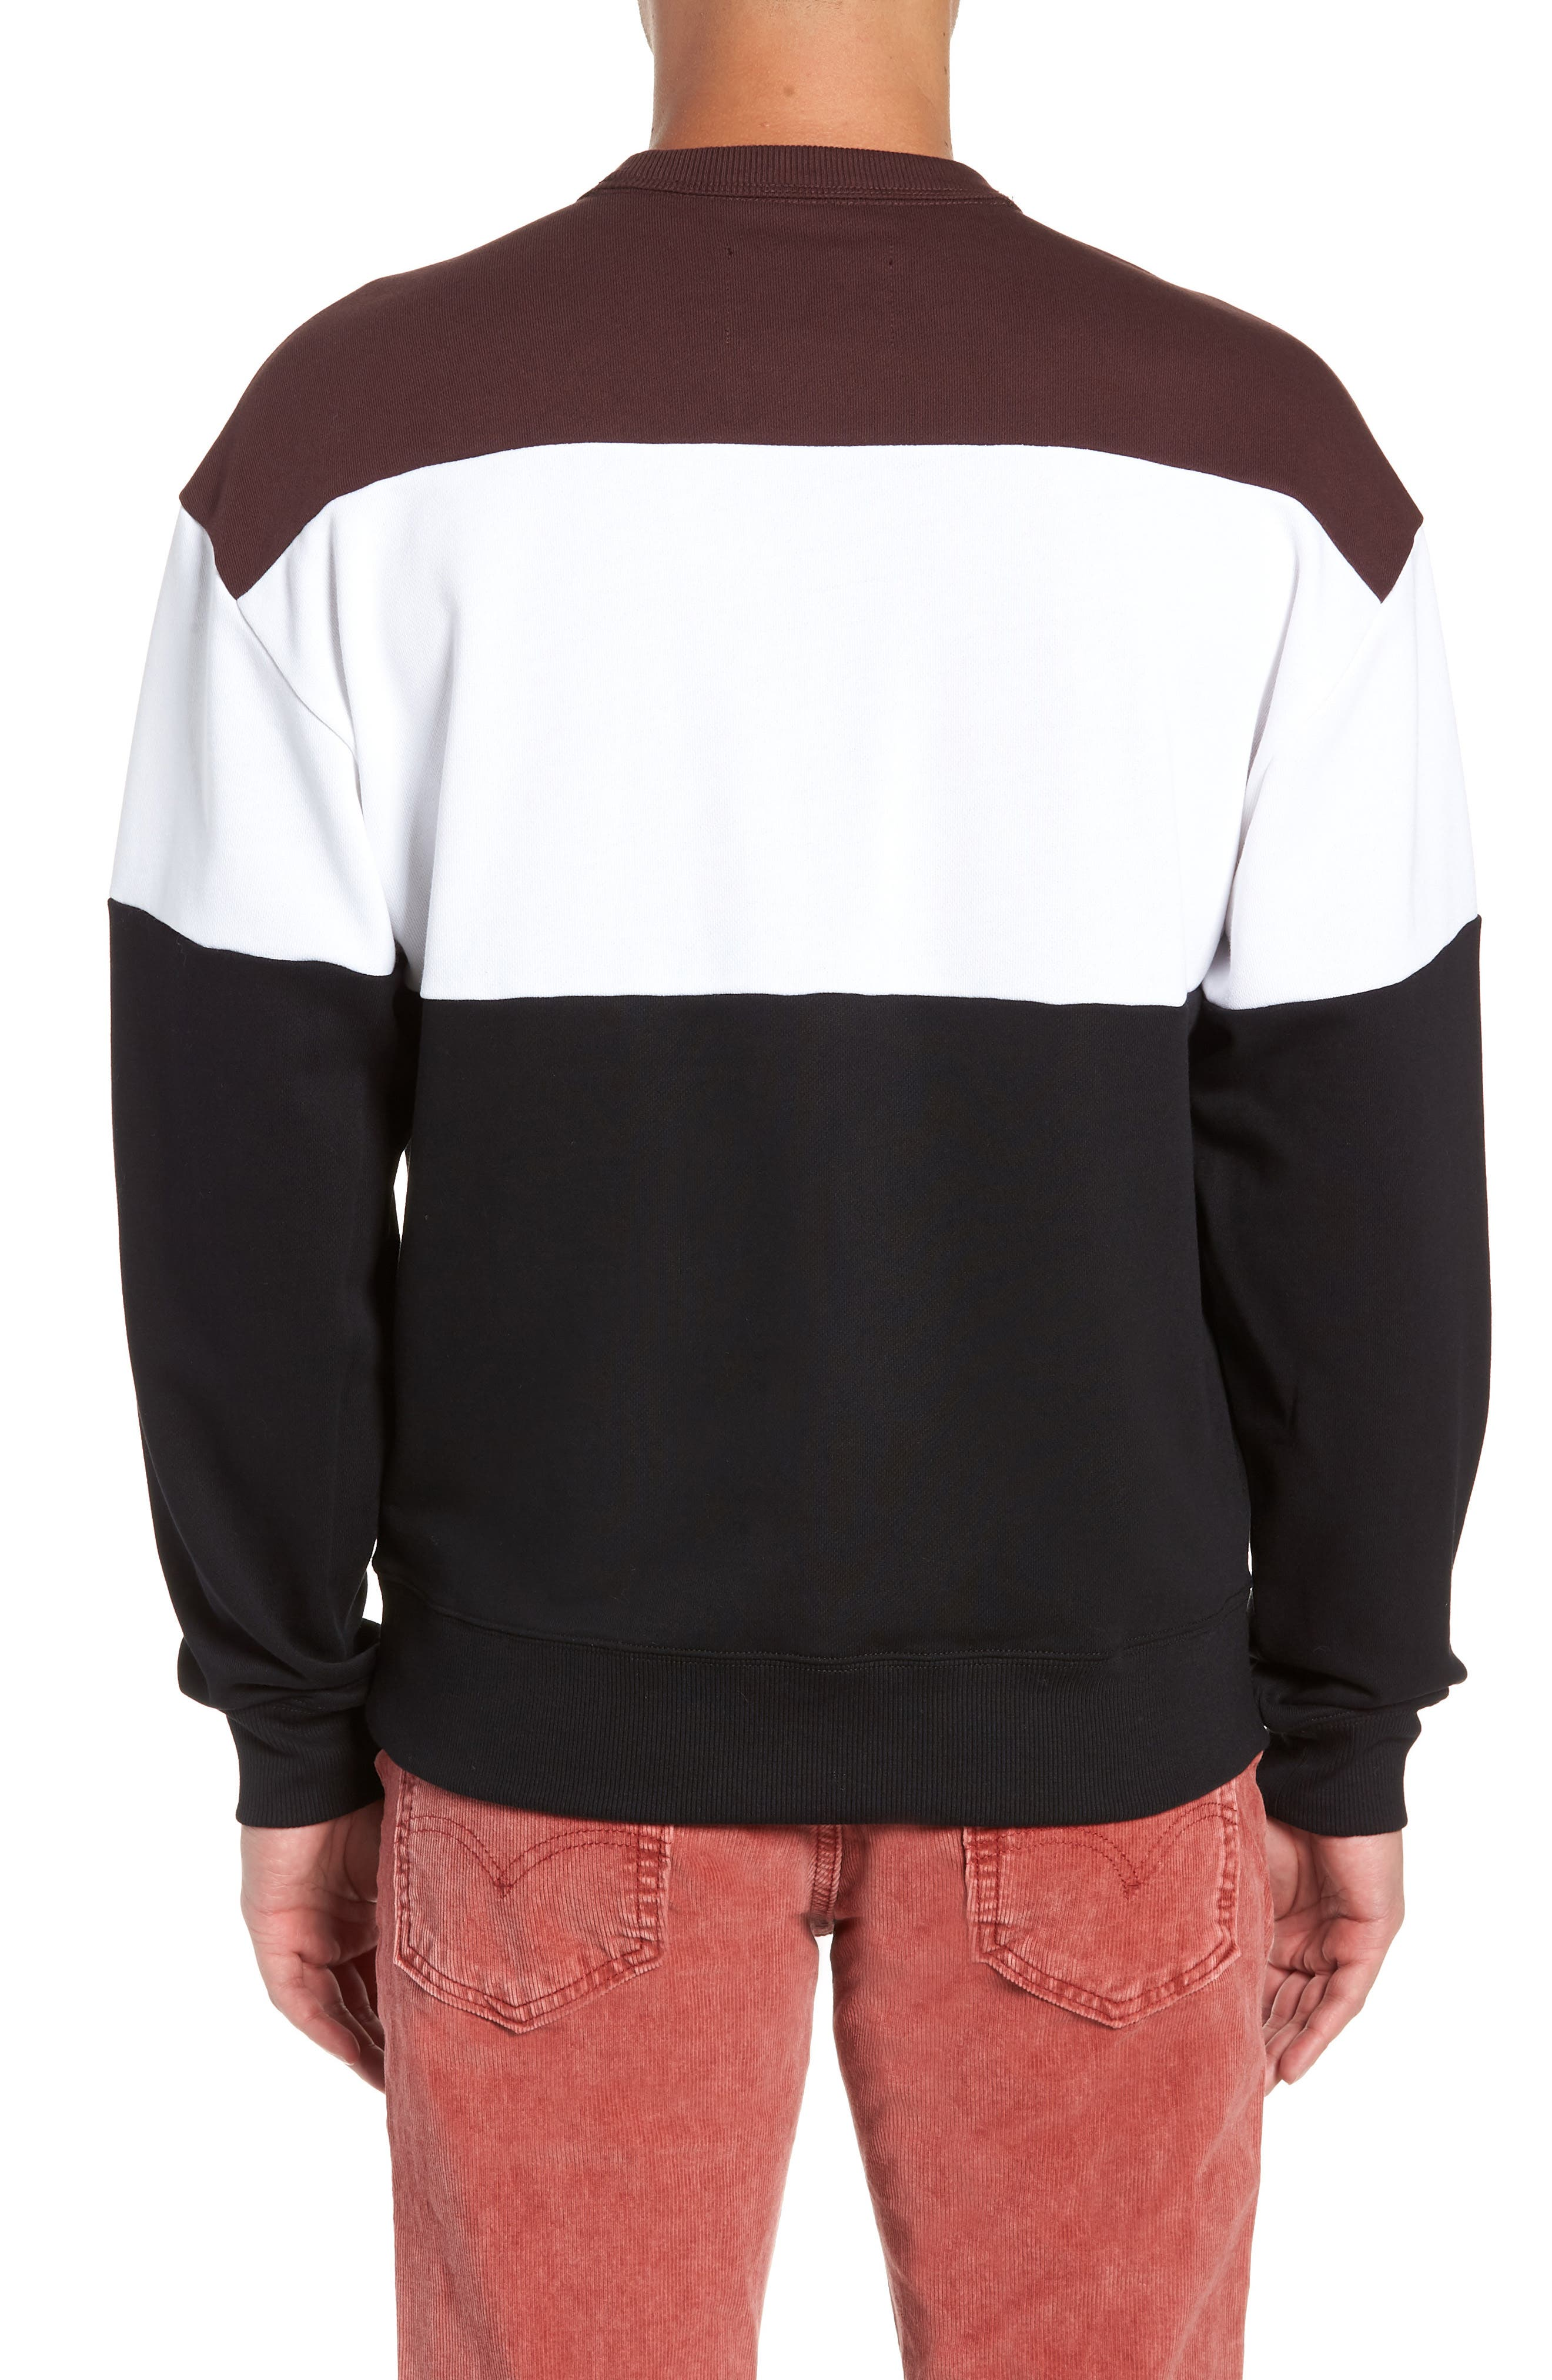 Libe Core Colorblock Sweatshirt,                             Alternate thumbnail 2, color,                             001